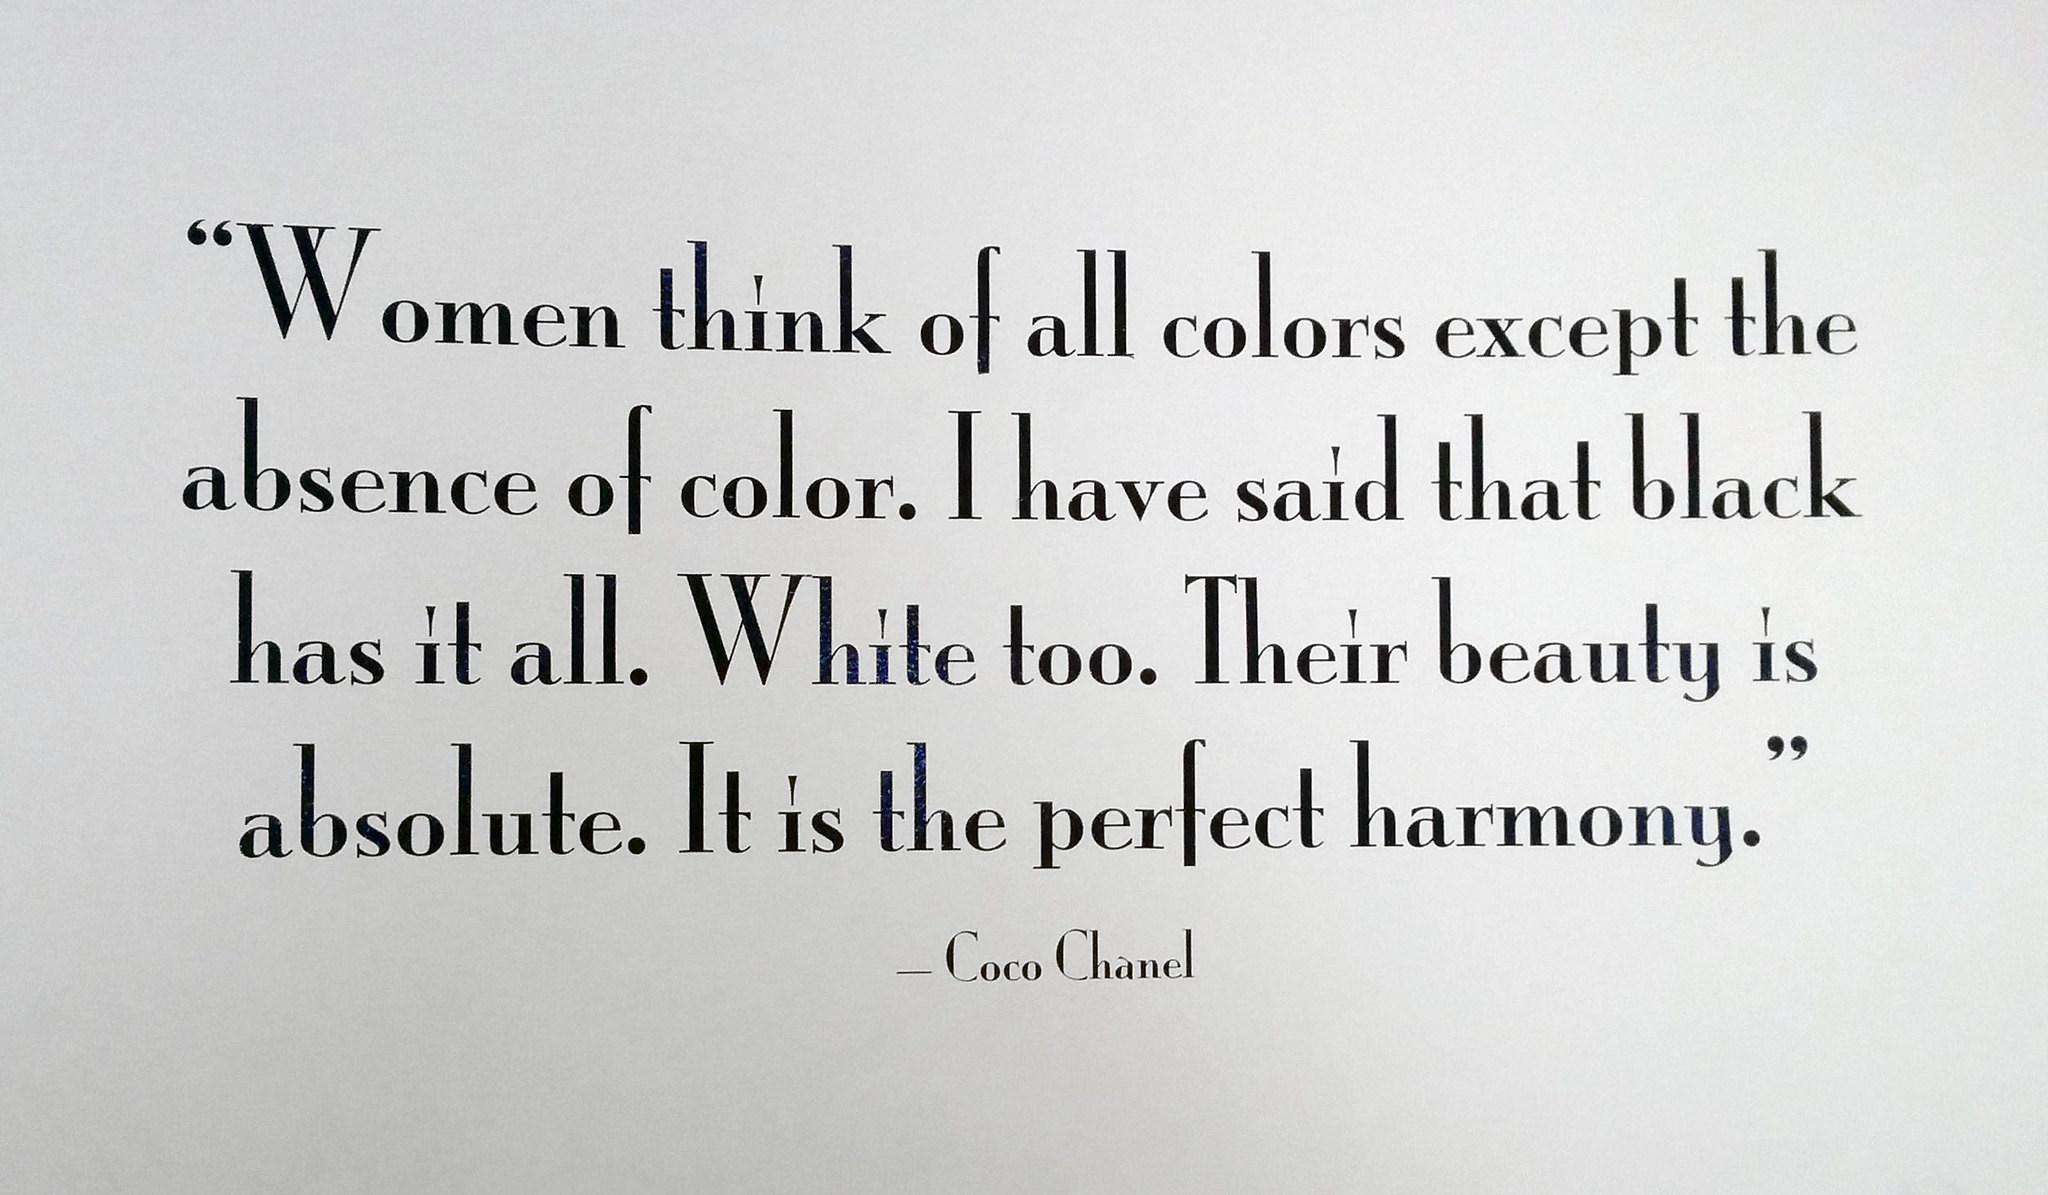 8 - Coco Chanel